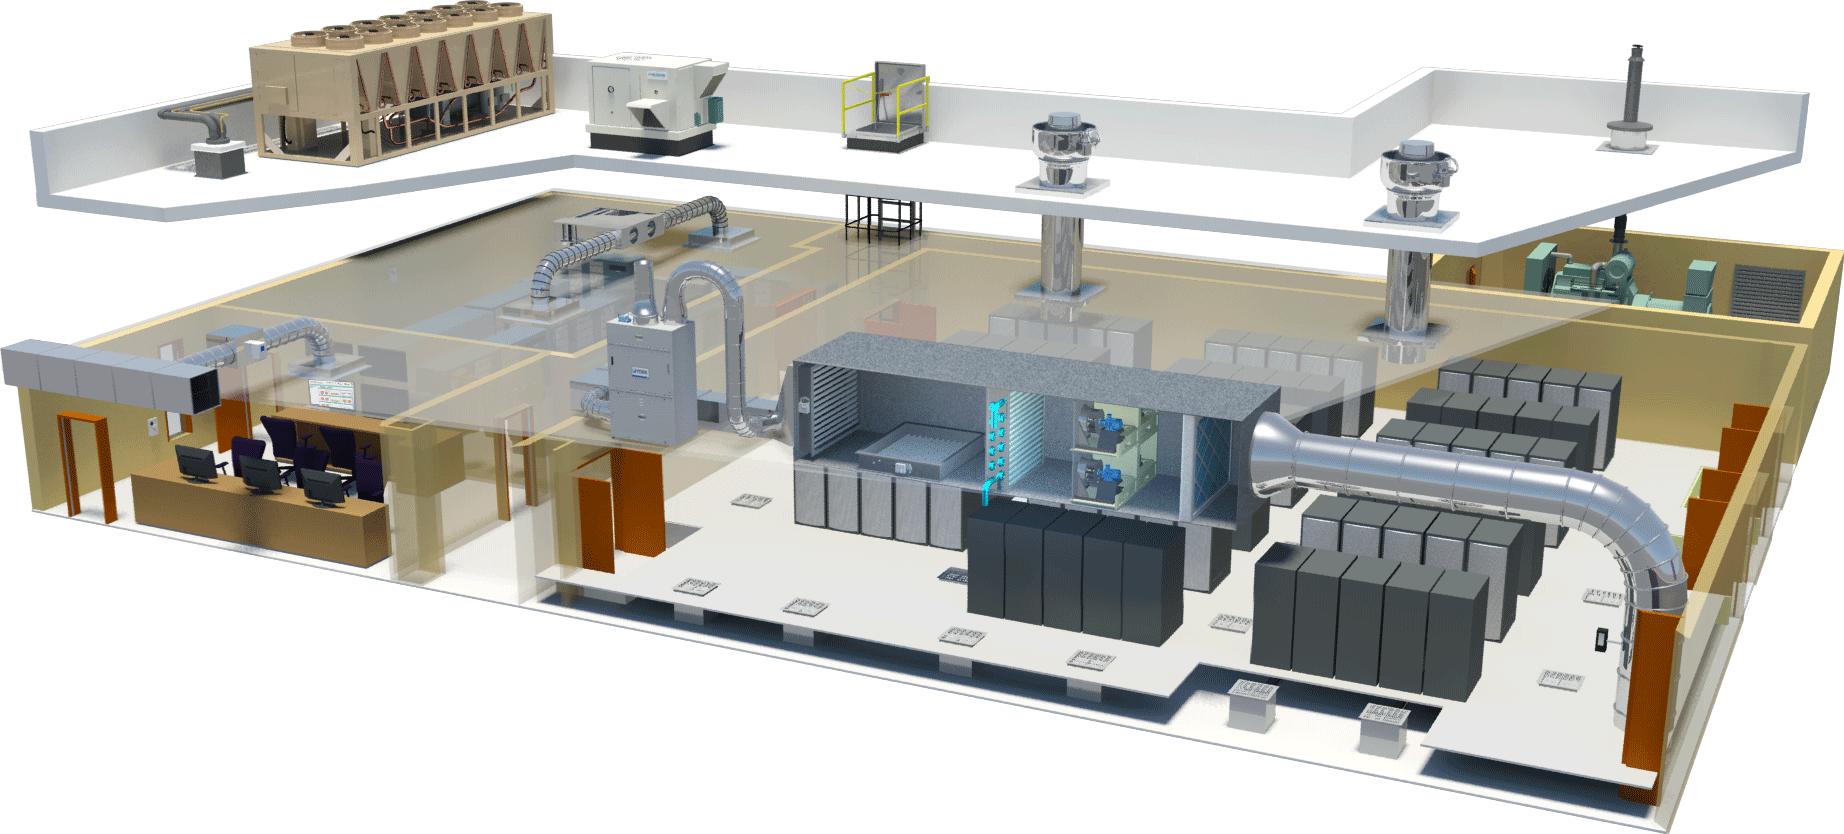 data center solution johnson controls. Black Bedroom Furniture Sets. Home Design Ideas